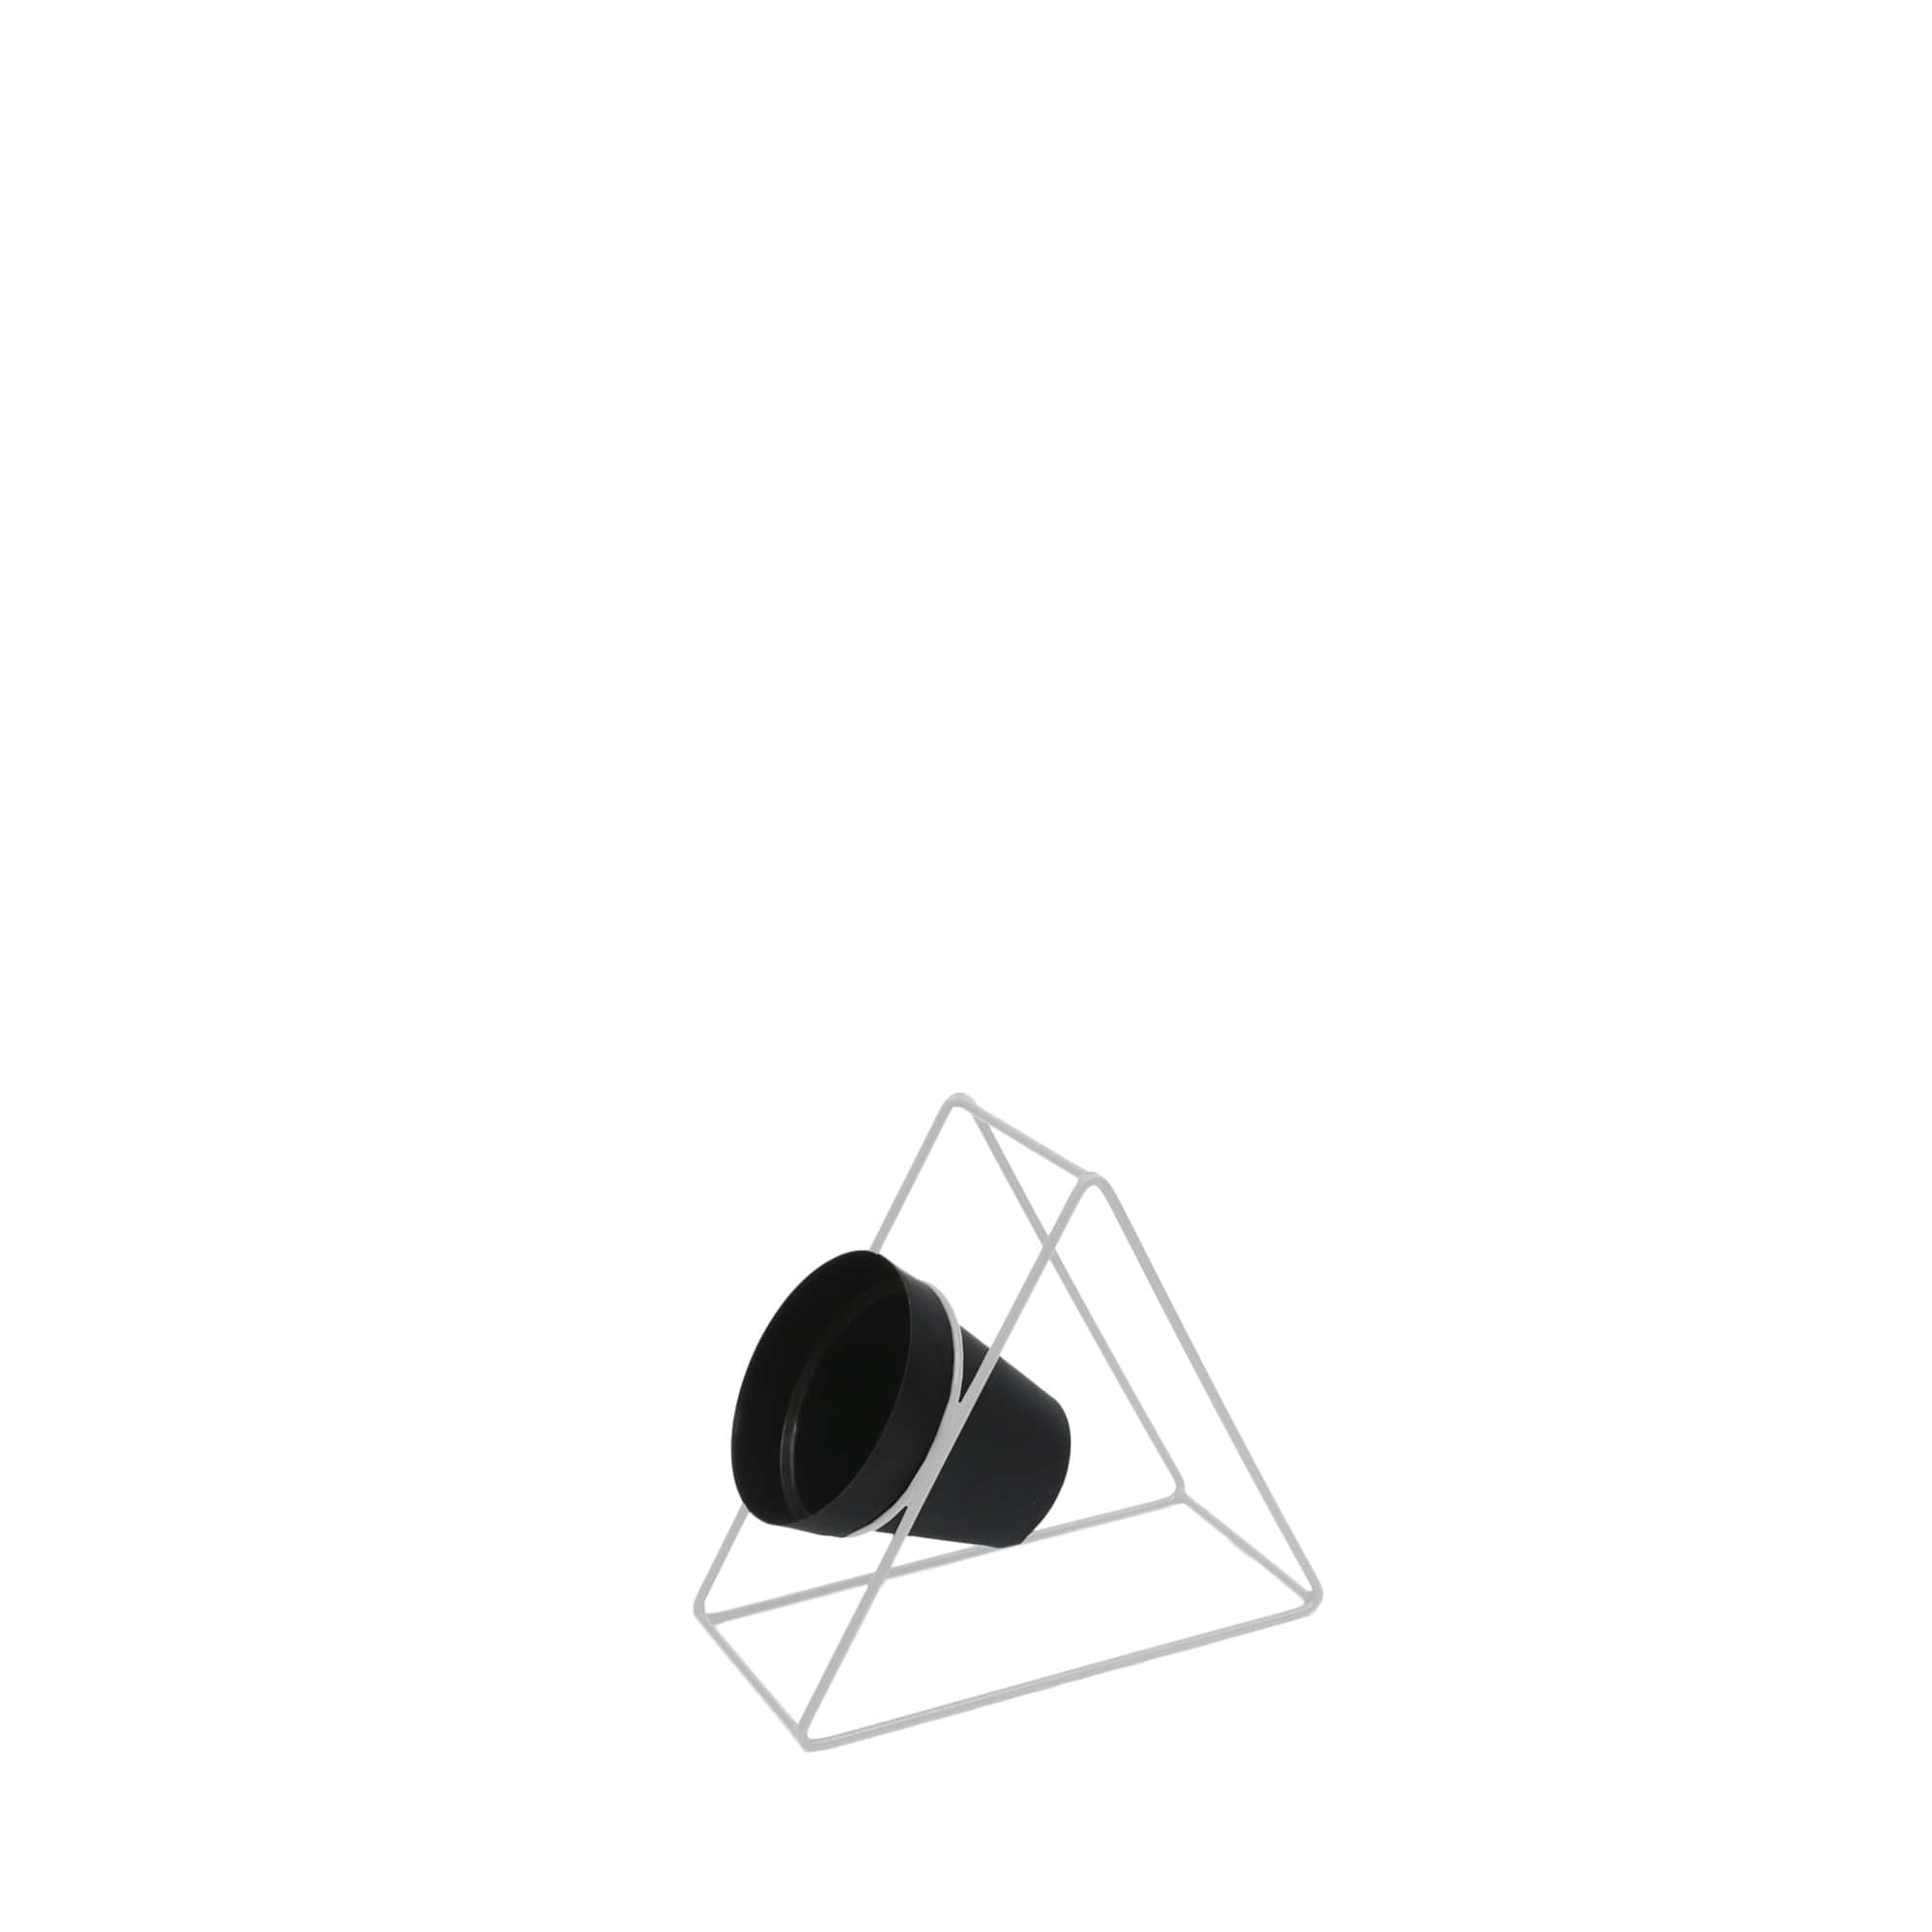 Suporte Ferro Triângulo Parede 24 x 24 cm Branco Vasart